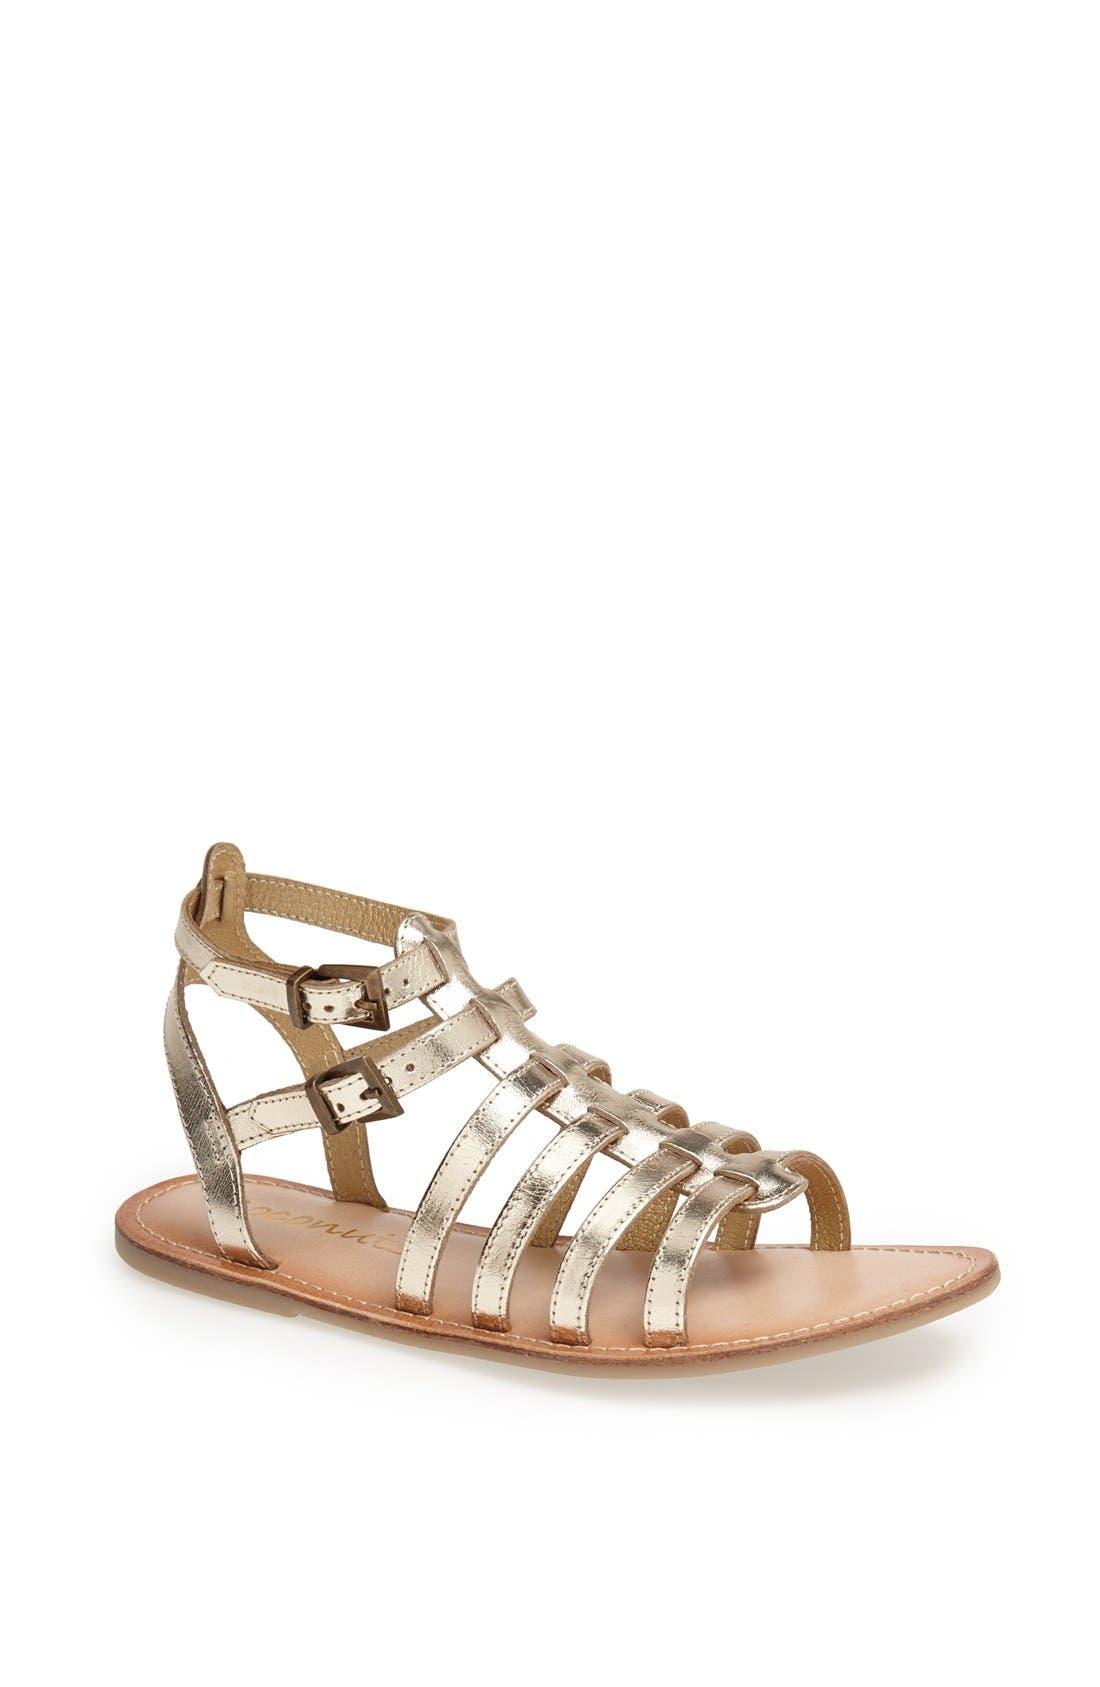 Main Image - Matisse 'Storybook' Flat Leather Sandal